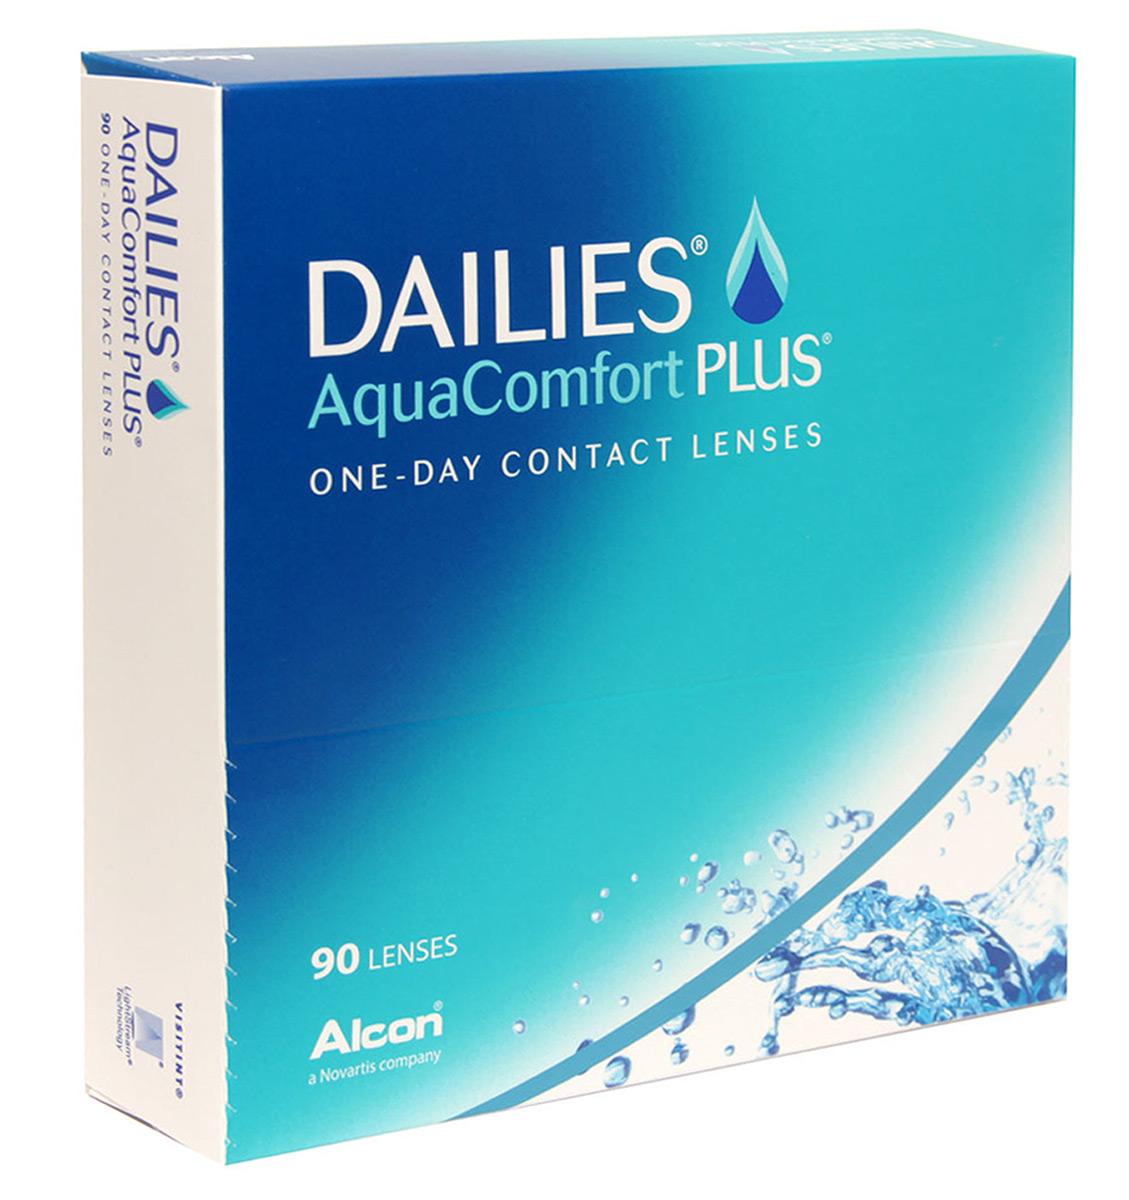 Alcon-CIBA Vision контактные линзы Dailies AquaComfort Plus (90шт / 8.7 / 14.0 / +6.00)